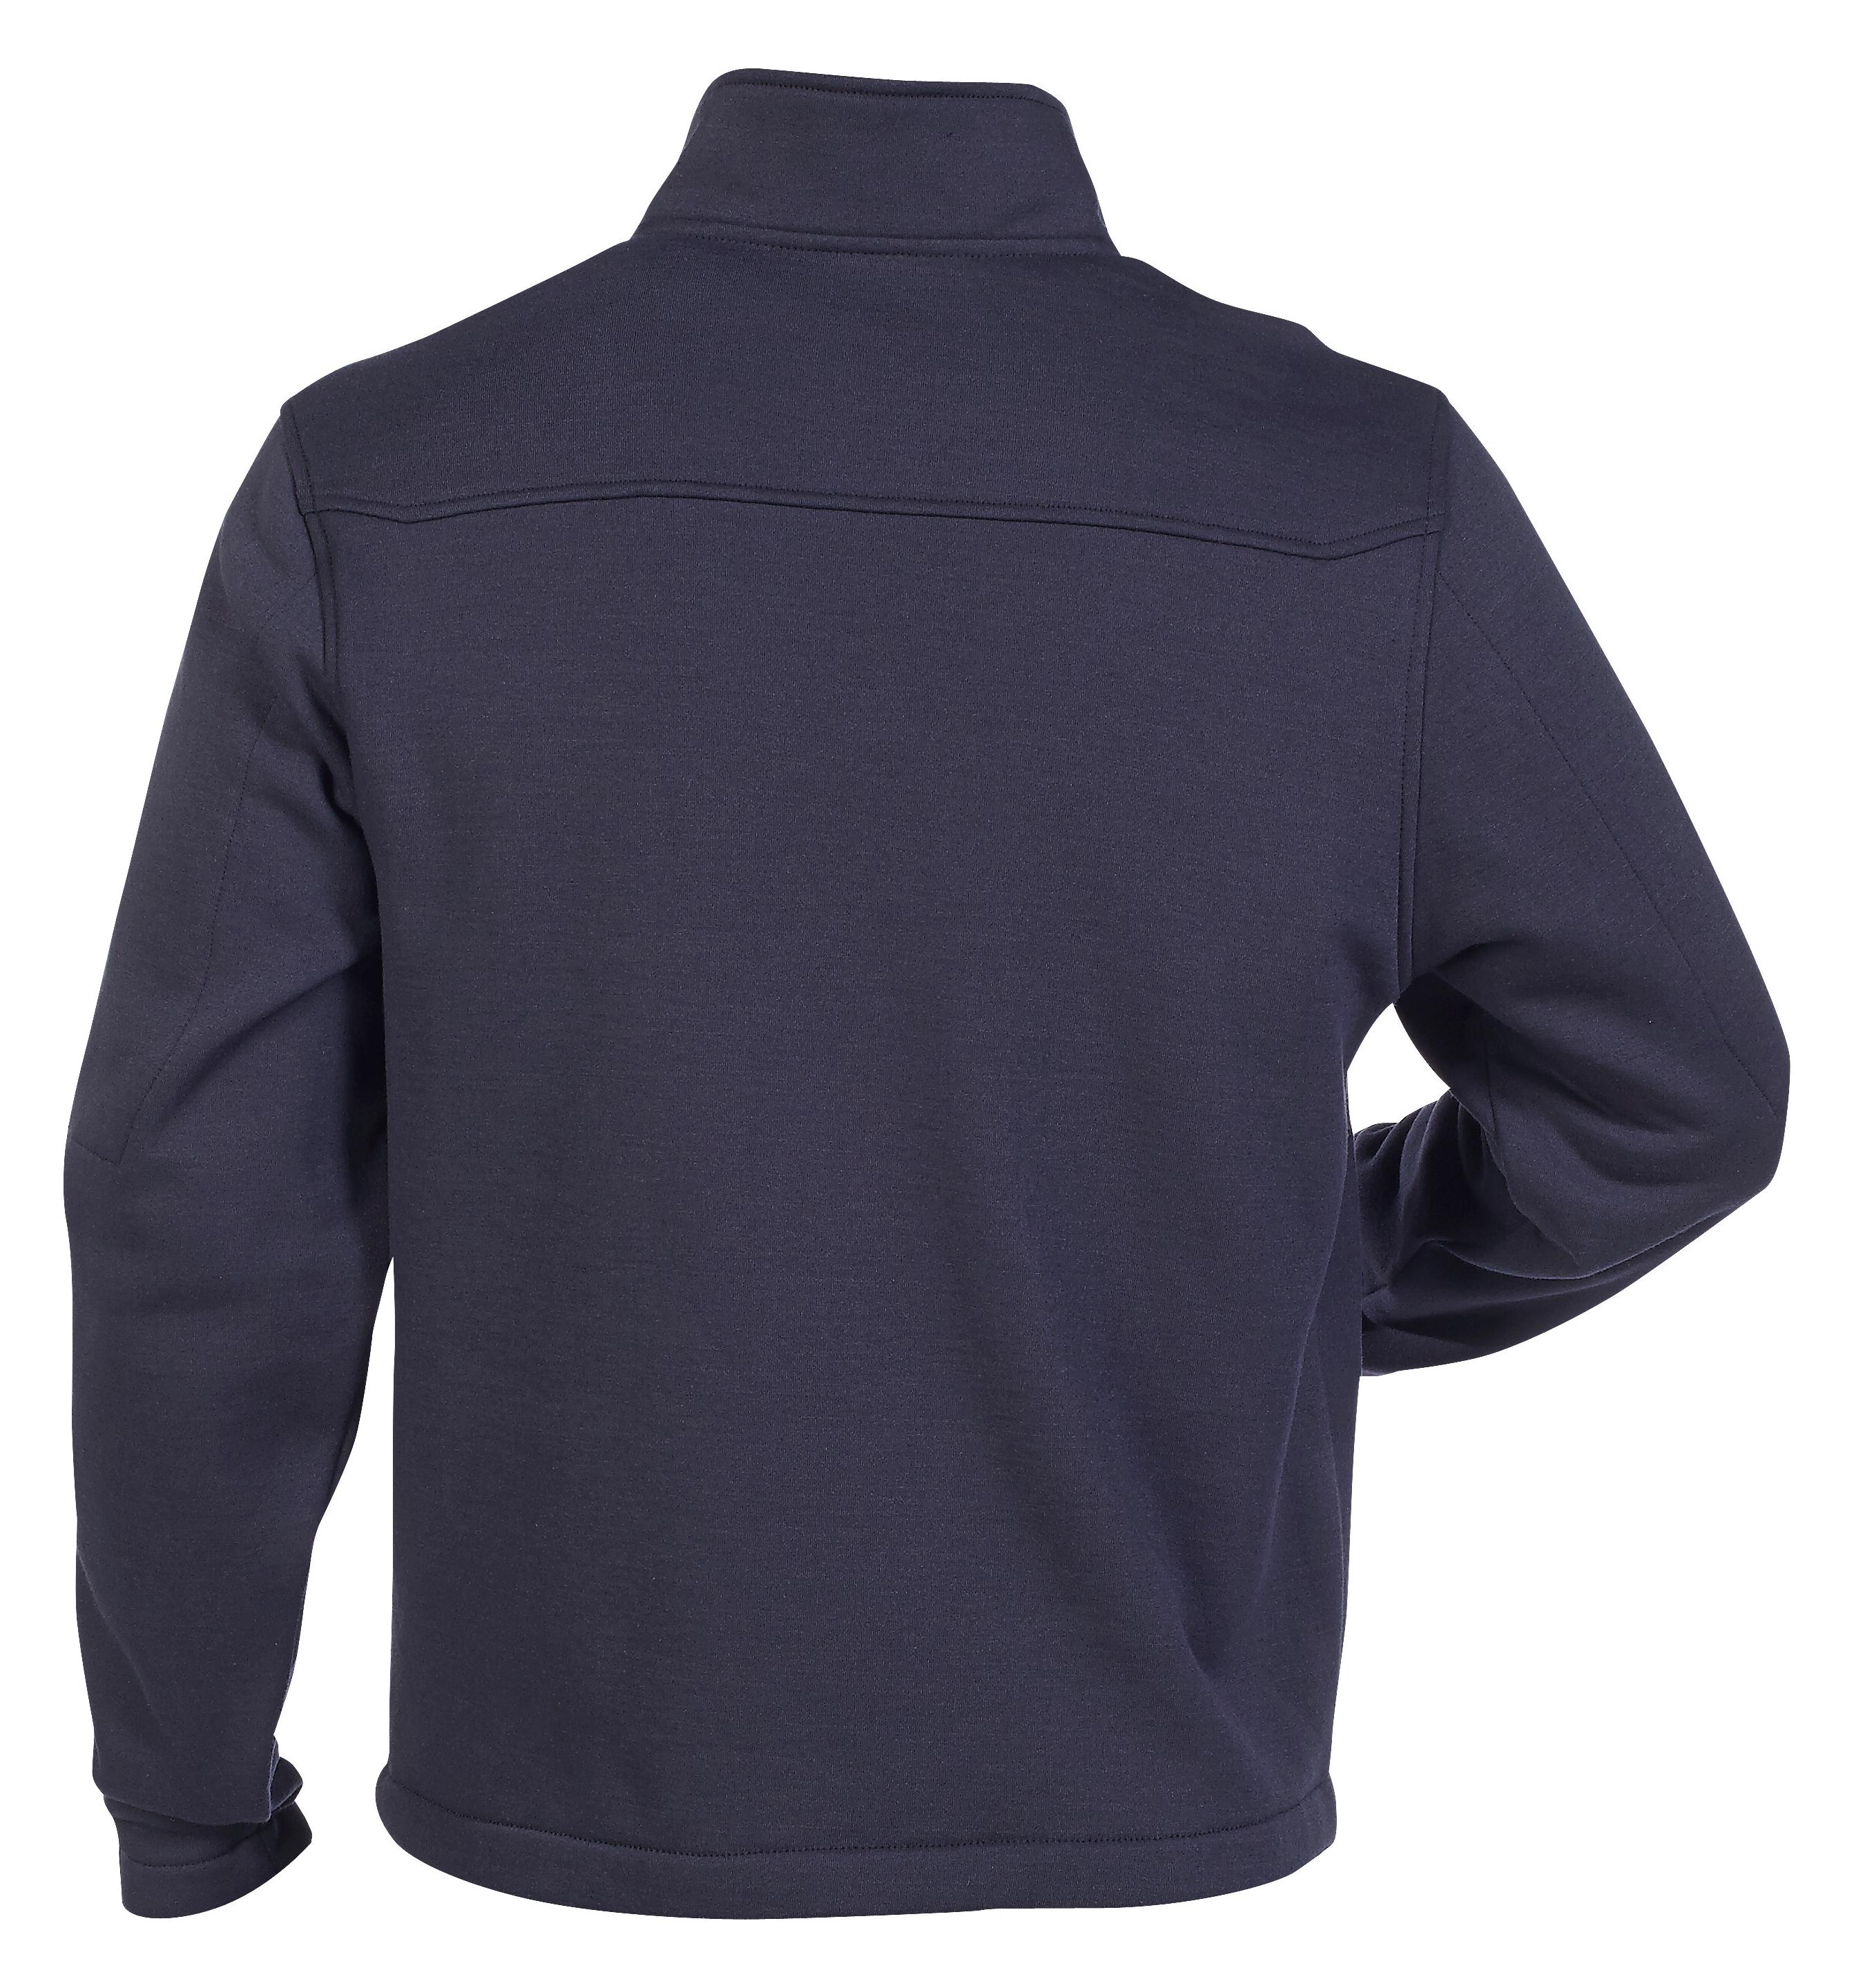 5.11 Tactical FR Polartec Fleece Jacket   Sheplers